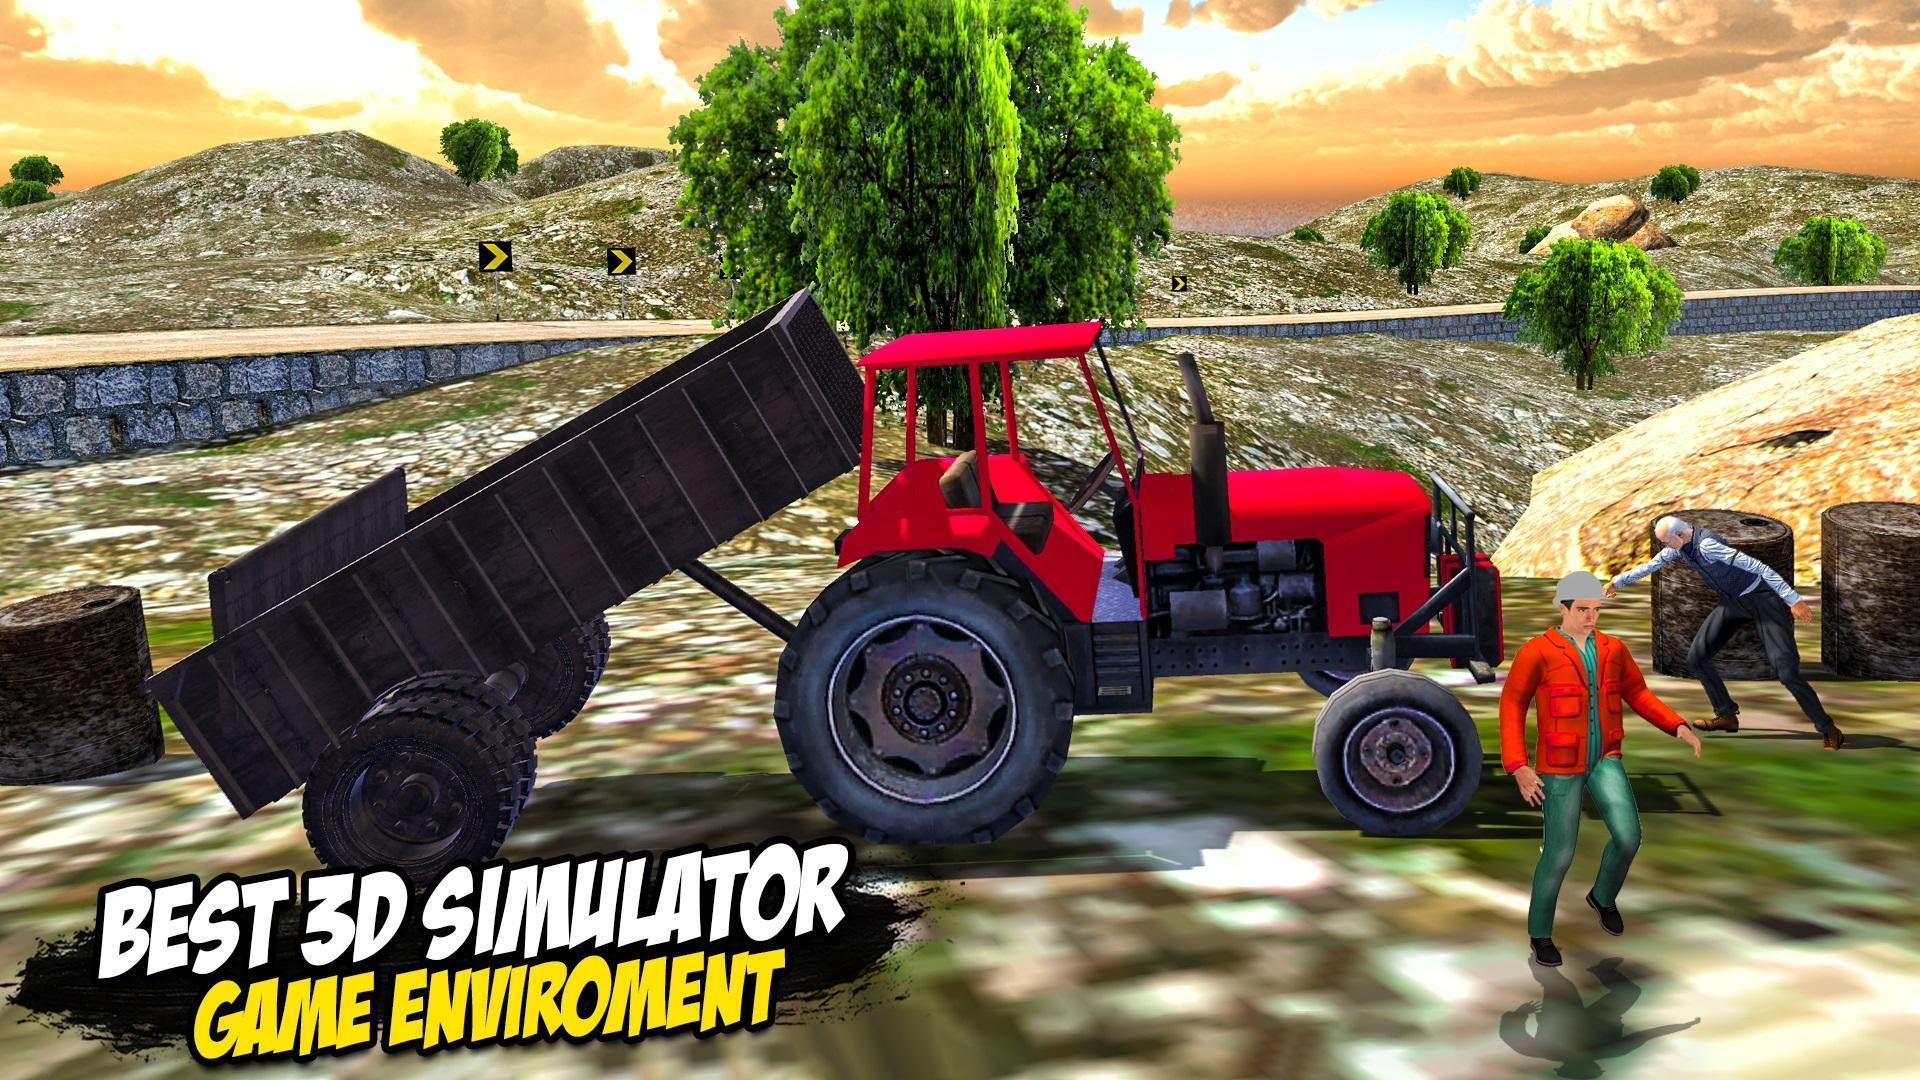 Heavy Tractor Trolley: Tractor Cargo Simulator🚜🚜 3.1 Screenshot 19